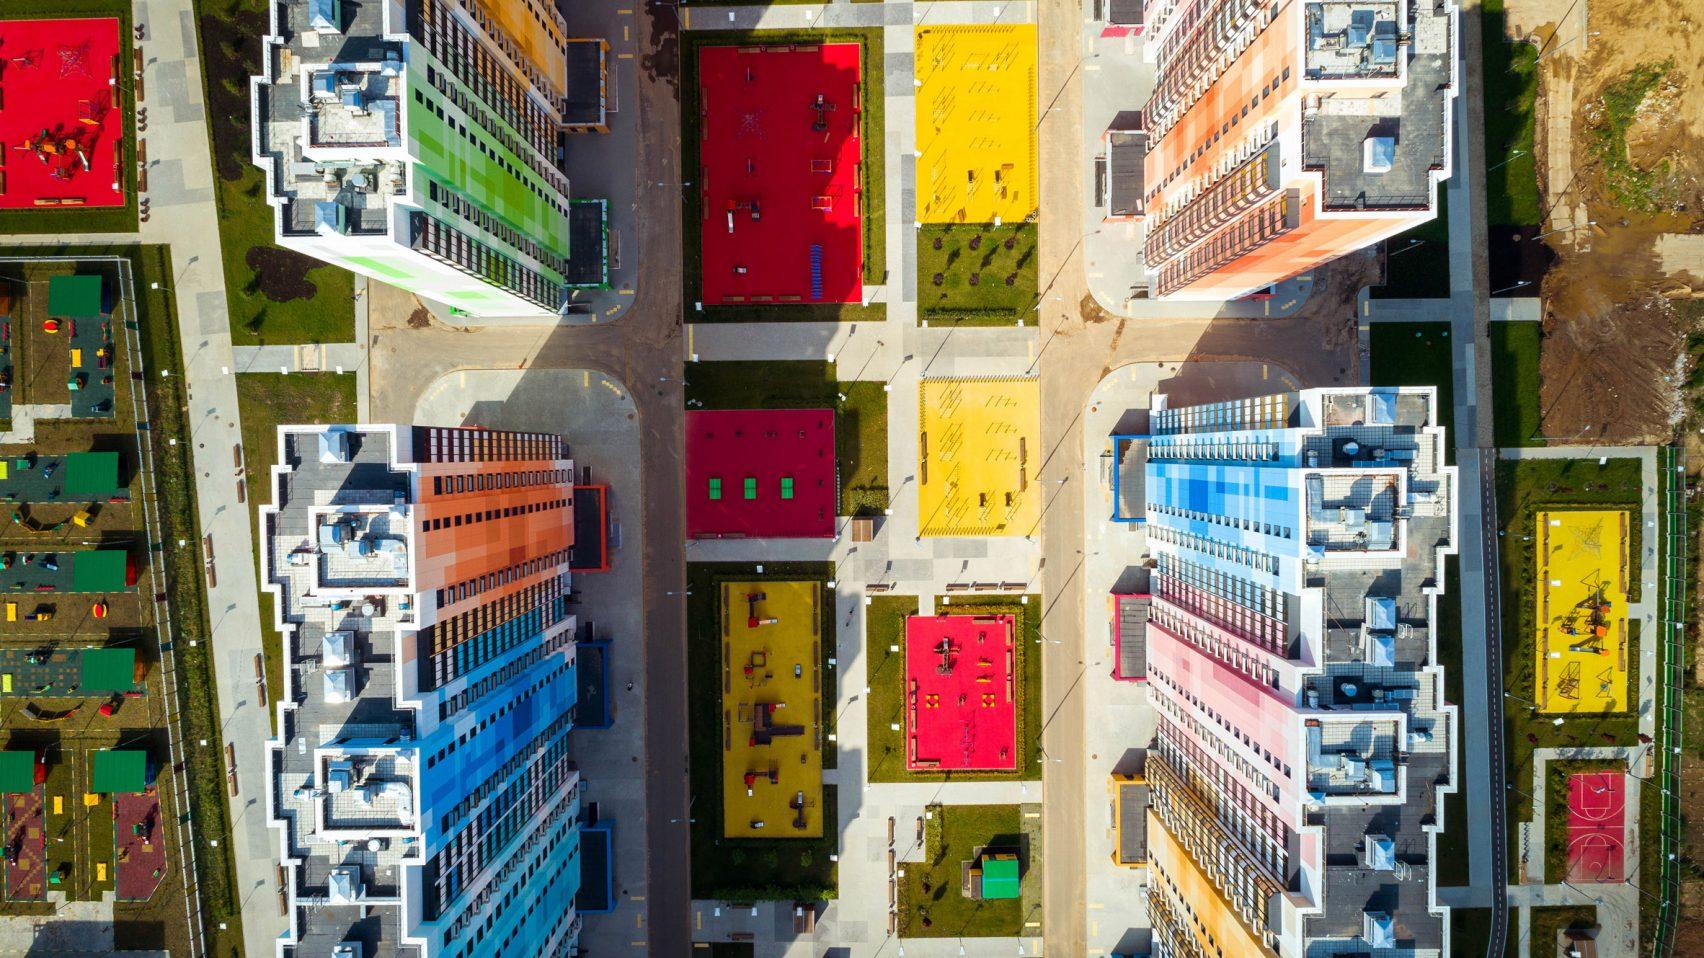 Formado por 47 edificios